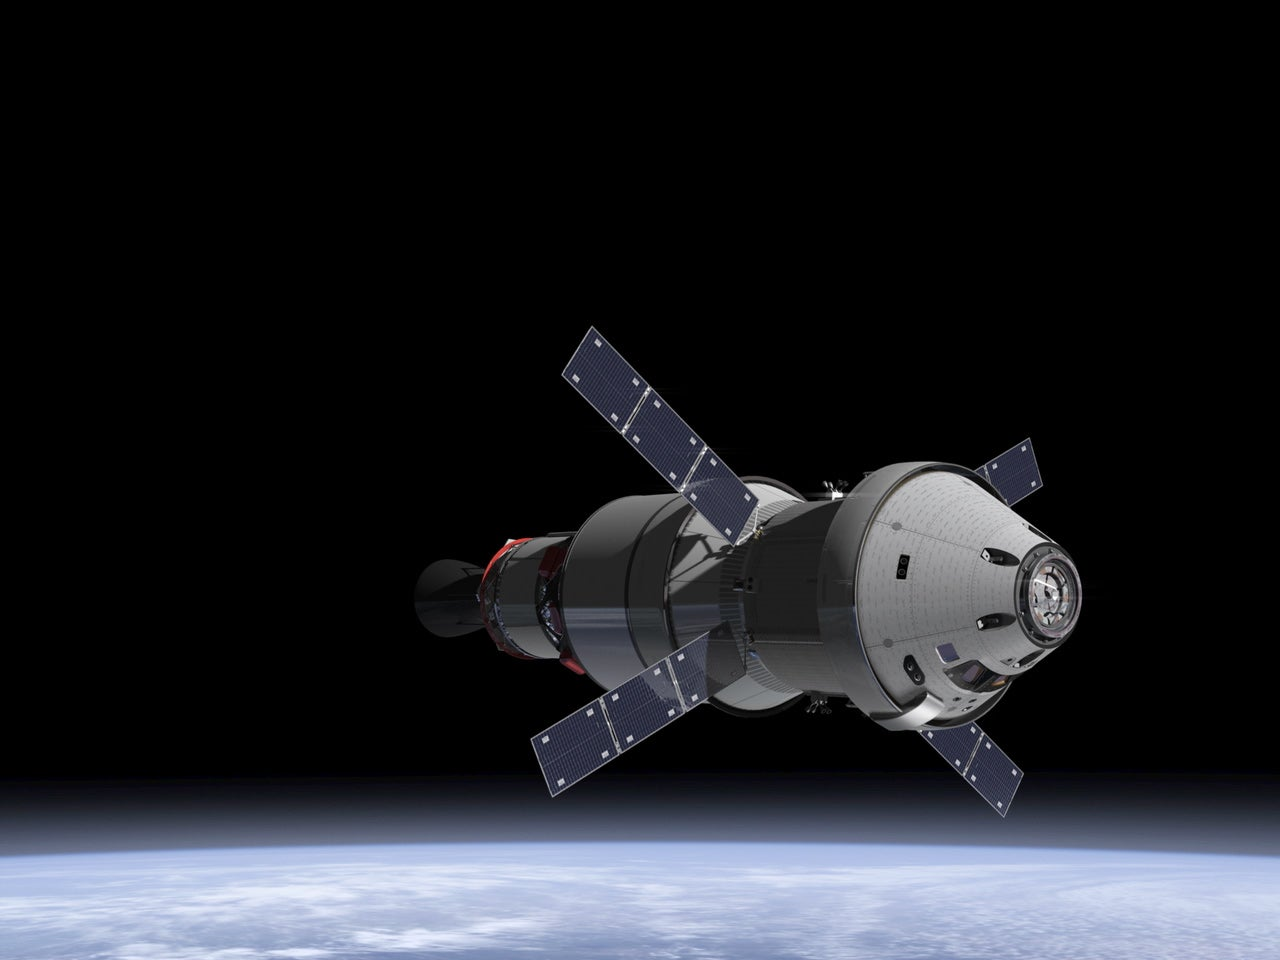 Orion's EFT-1 Isn't Quite Like Apollo 4